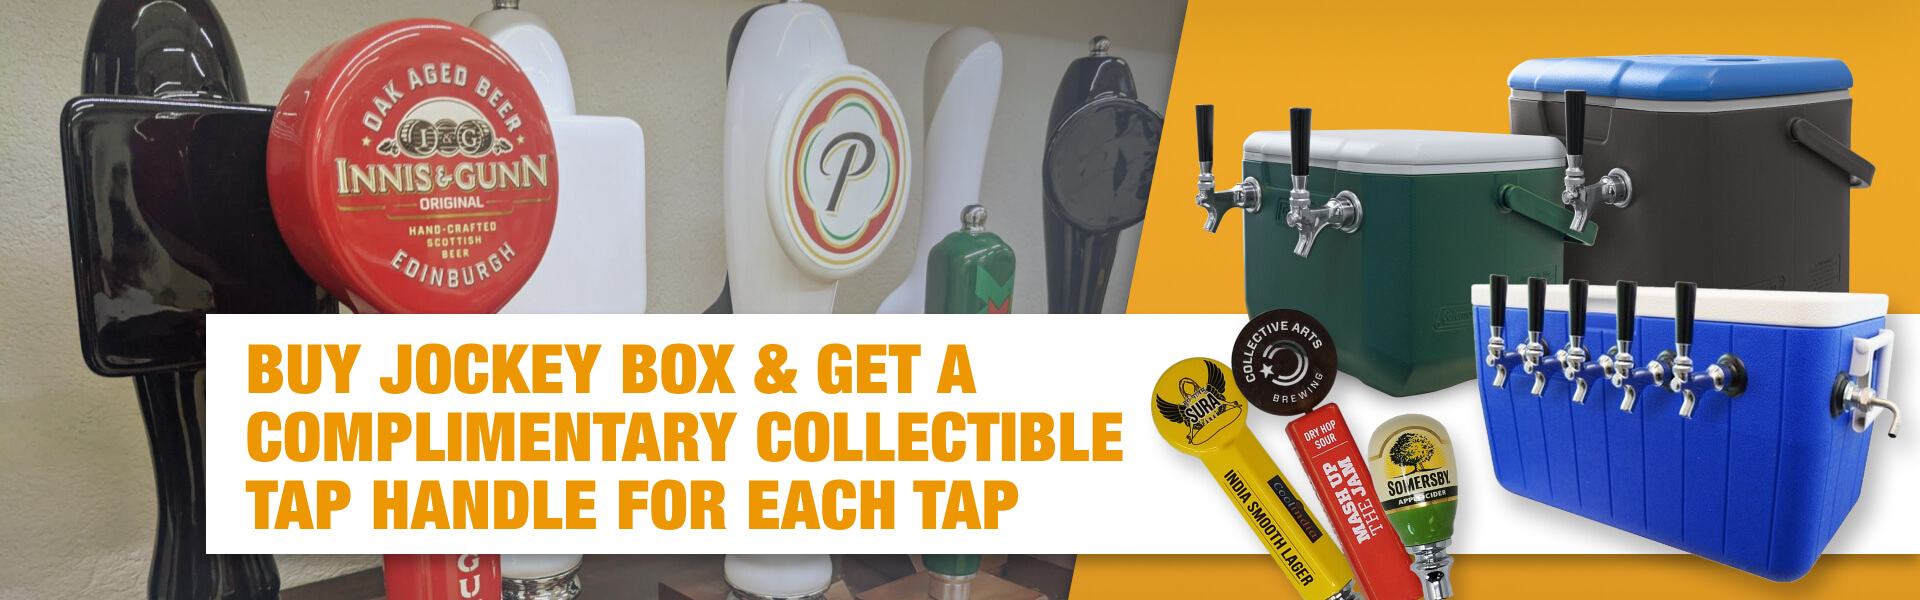 Beer Jockey Box Cooler promotion